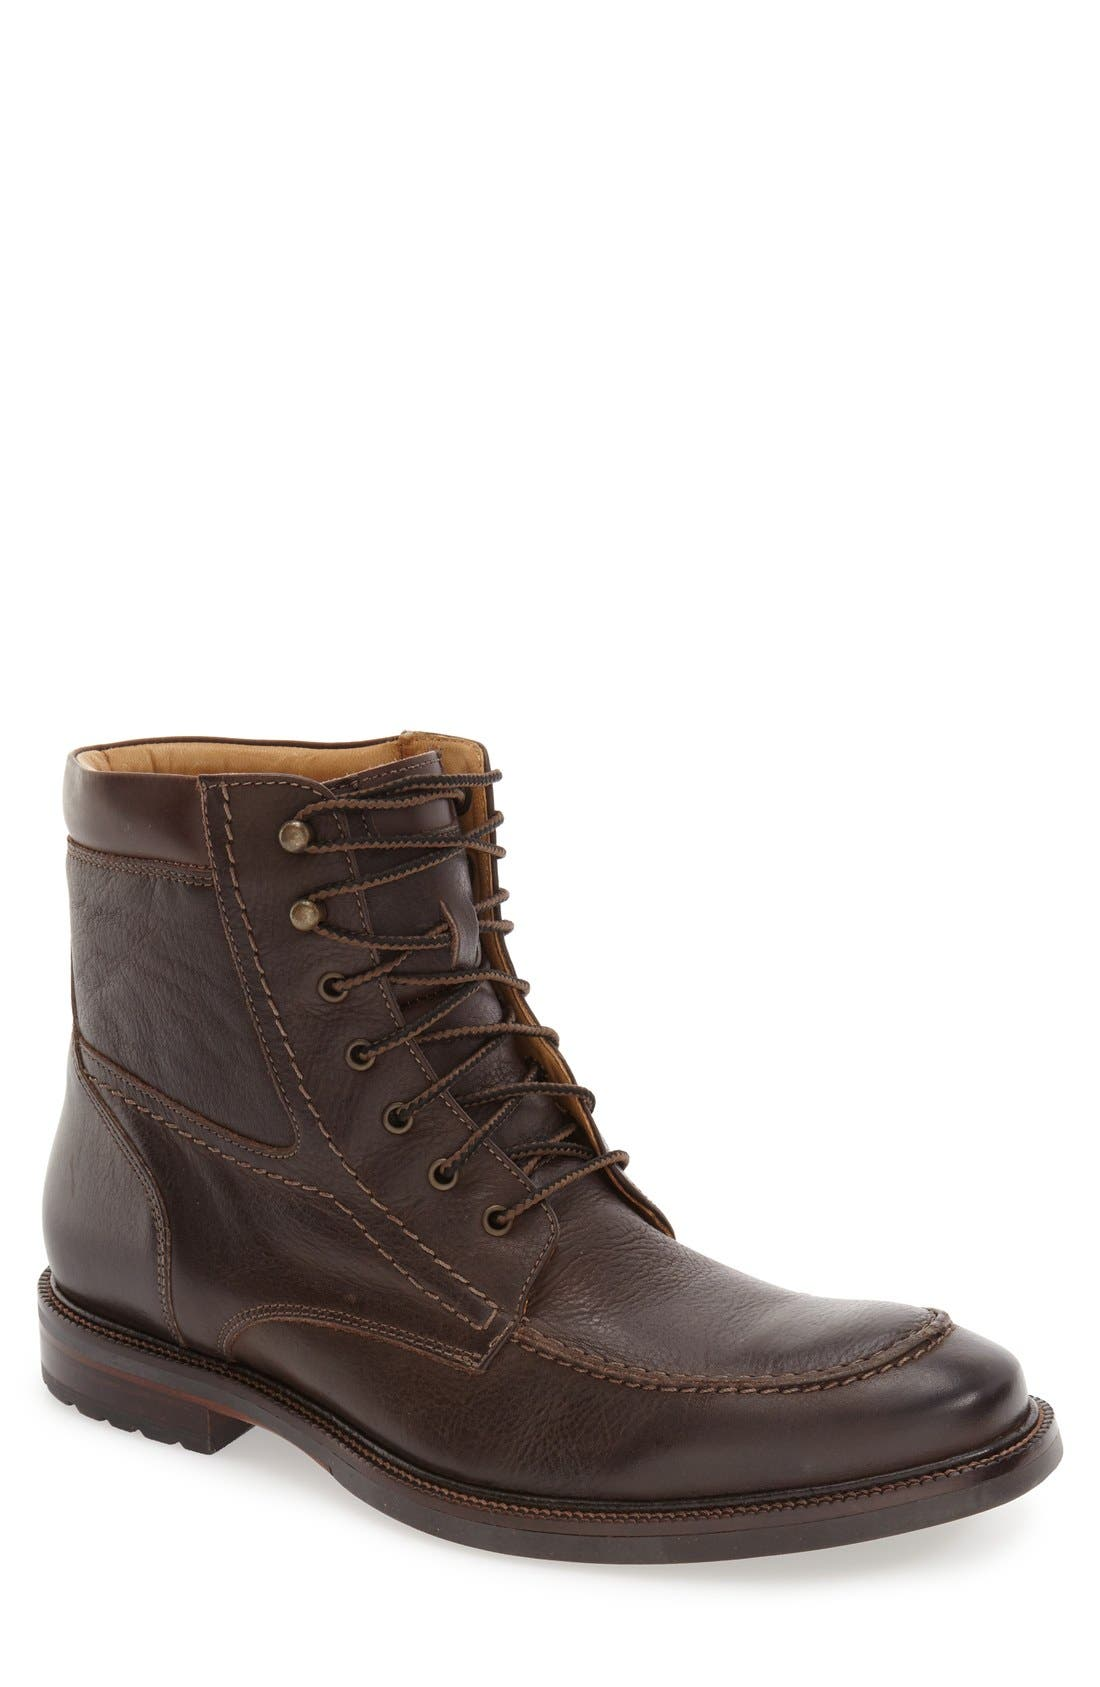 J&M 1850 'Baird' Moc Toe Boot